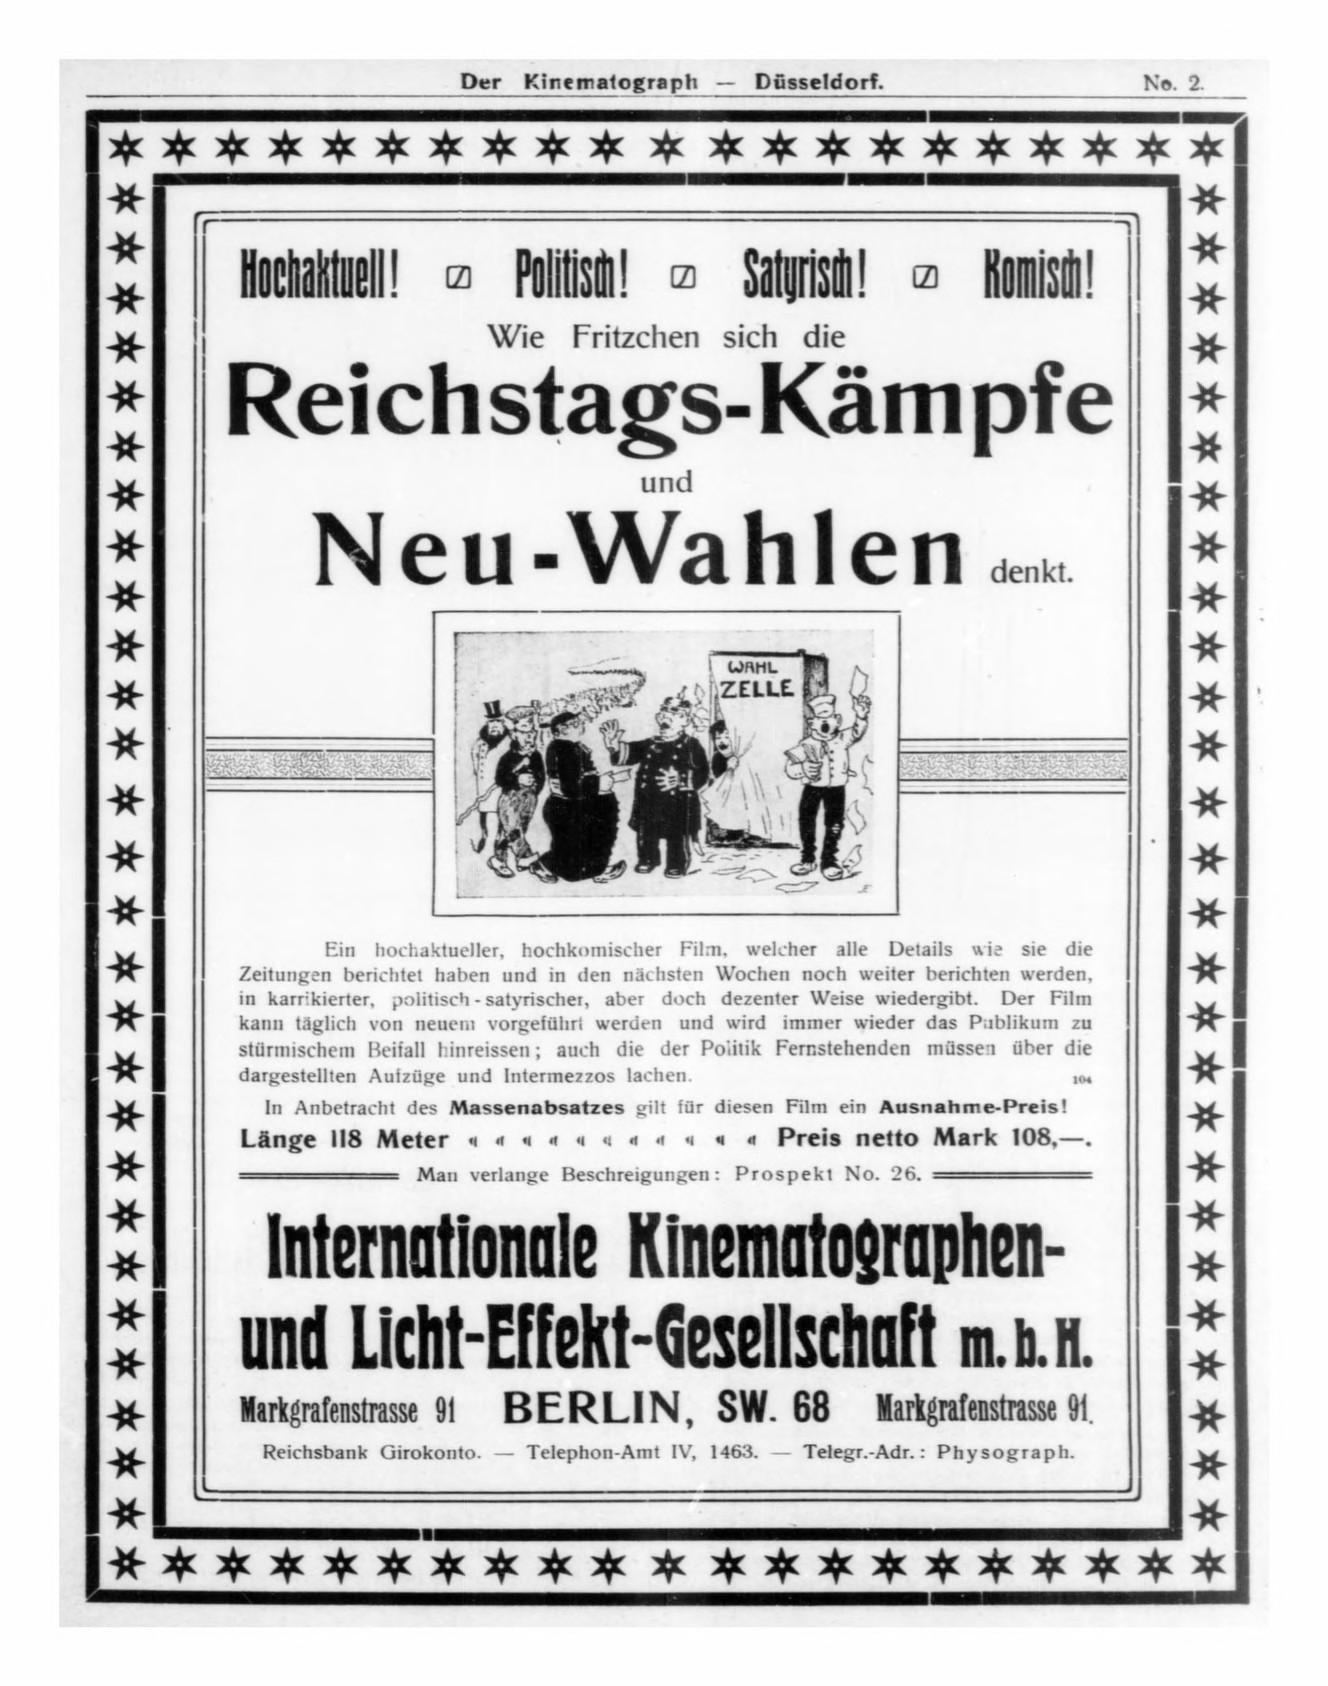 Kinematograph01-1907-01_jp2.zip&file=kinematograph01-1907-01_jp2%2fkinematograph01-1907-01_0014